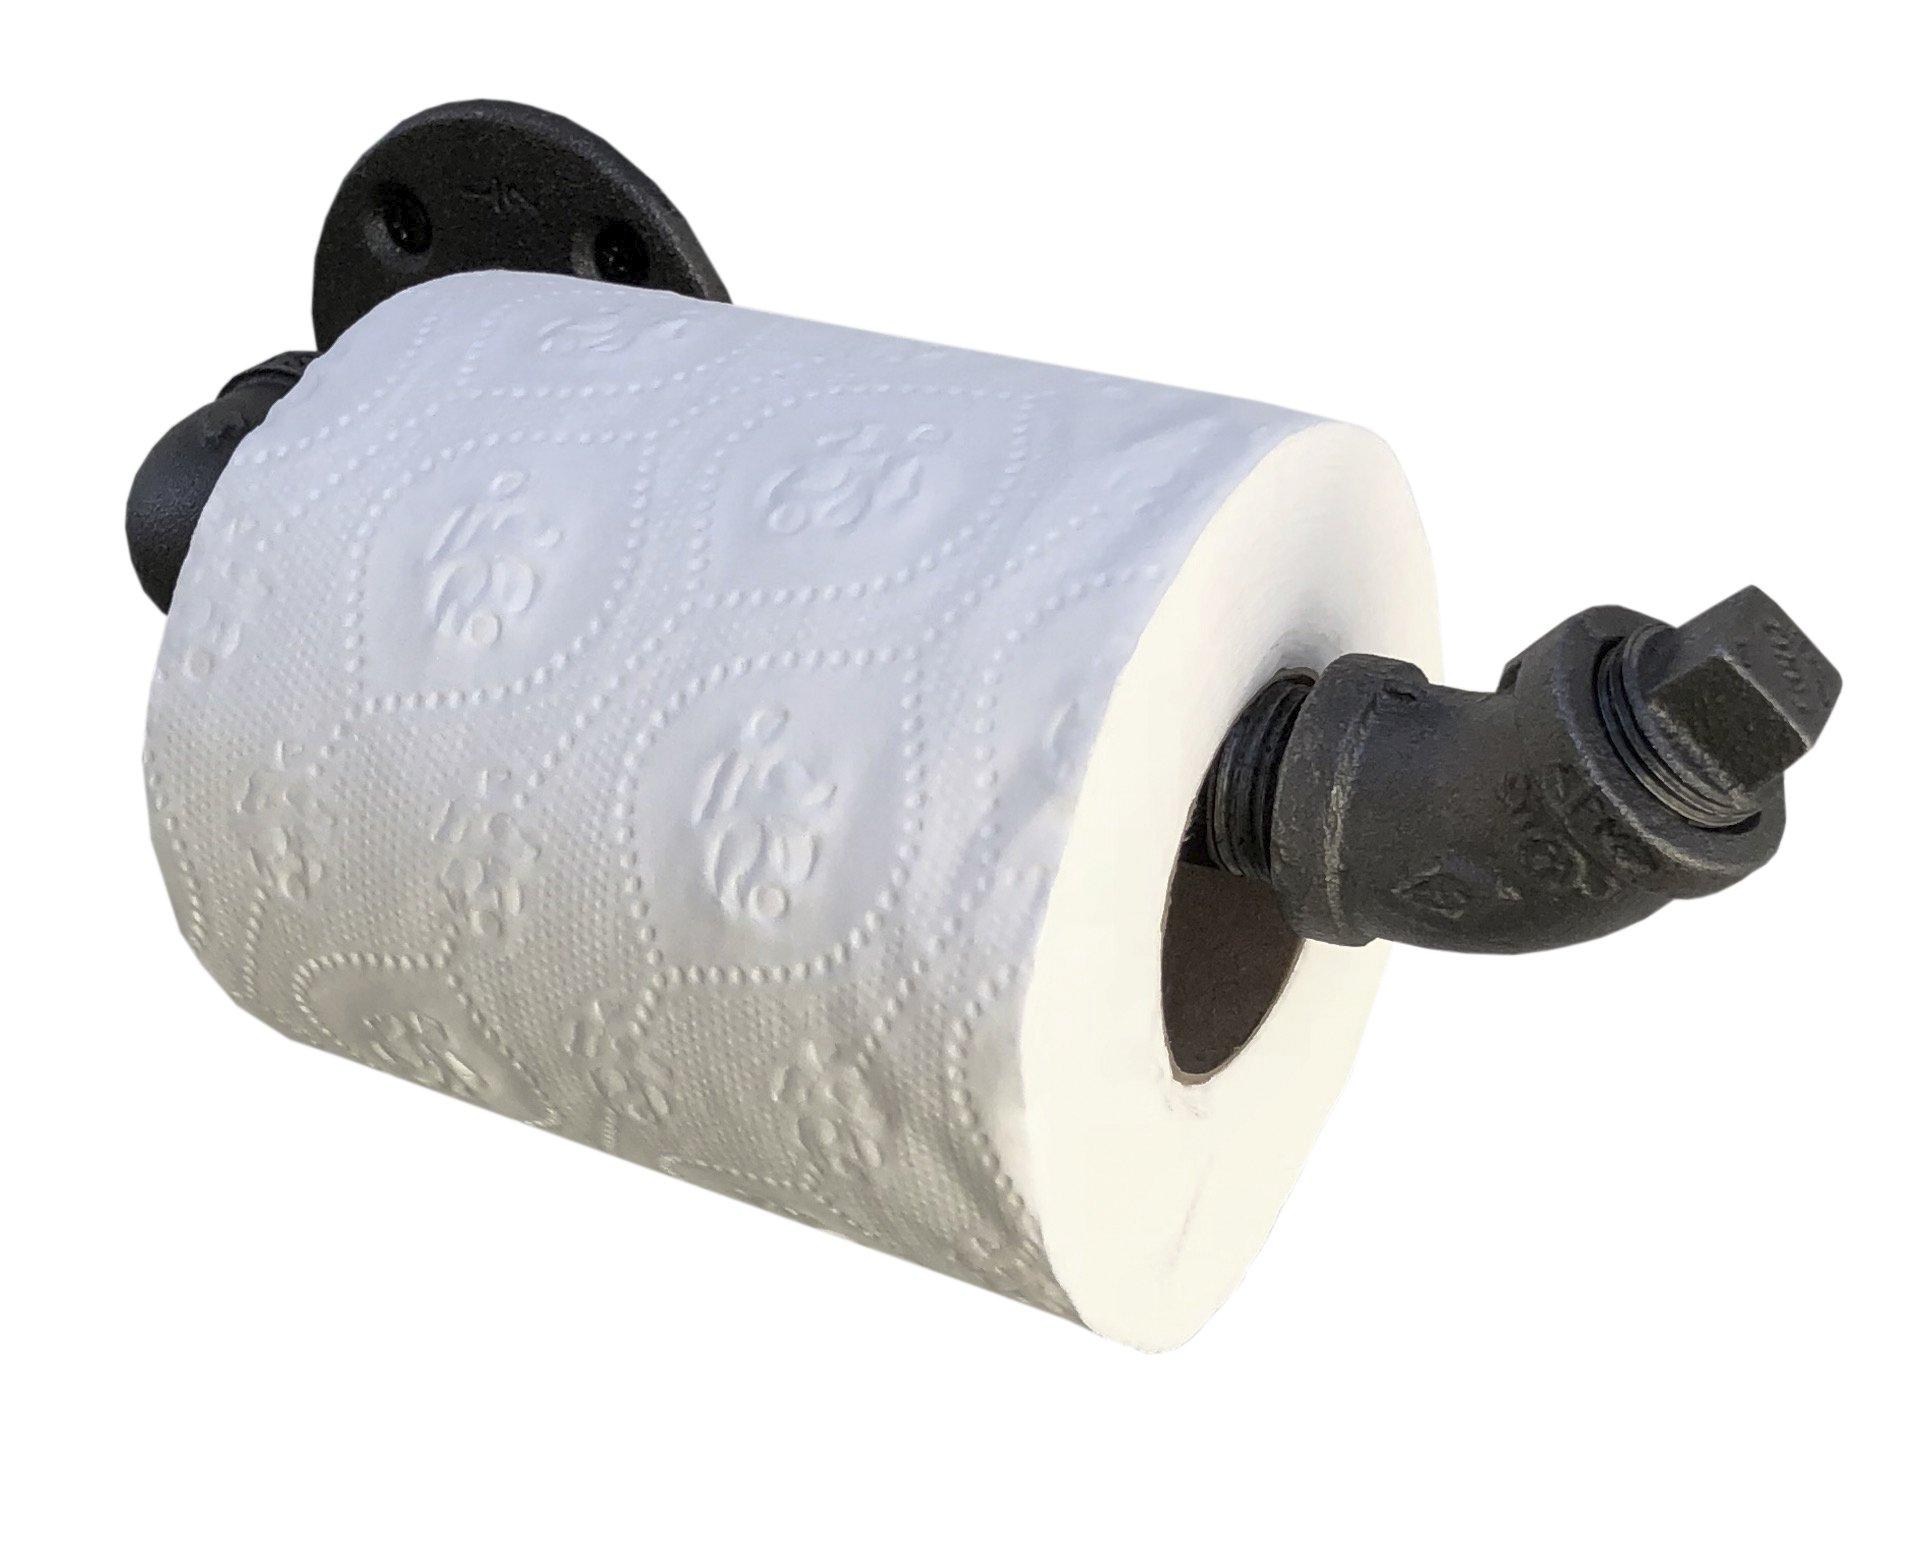 DIY CARTEL Industrial Pipe Toilet Paper Holder Black Malleable Iron - Heavy Duty - Perfect Modern, Minimalist, Rustic, Steampunk Industrial Furniture 3